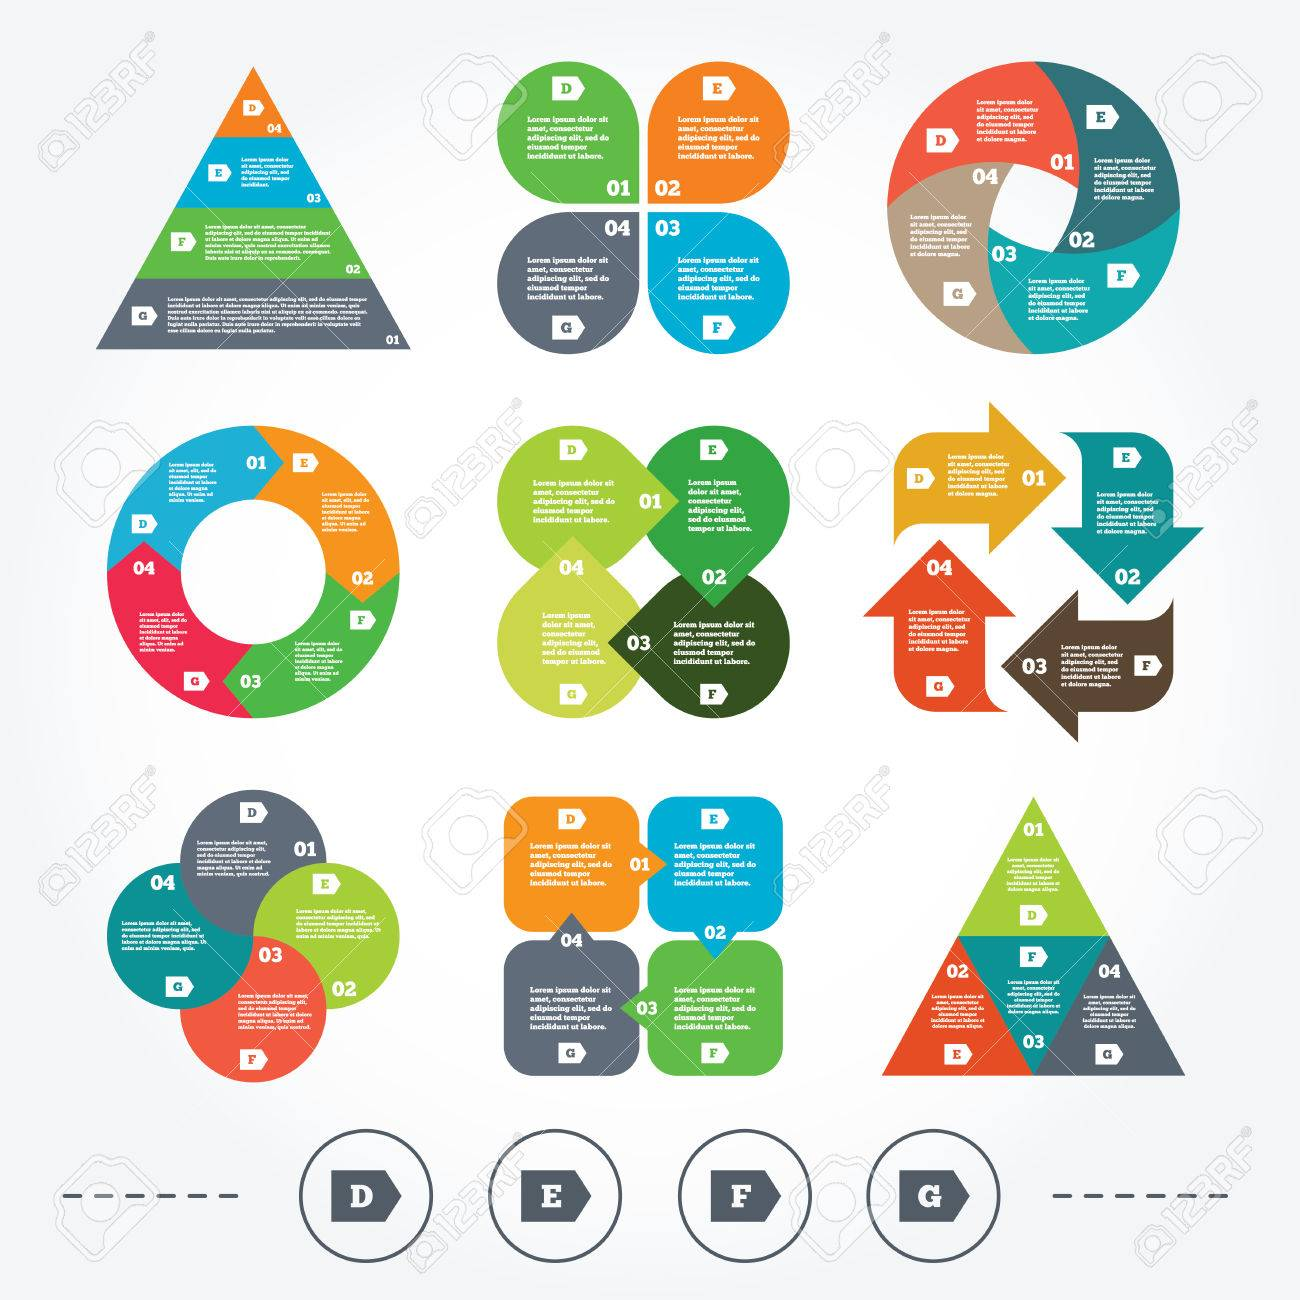 Circle and triangle diagram charts energy efficiency class icons circle and triangle diagram charts energy efficiency class icons energy consumption sign symbols ccuart Choice Image